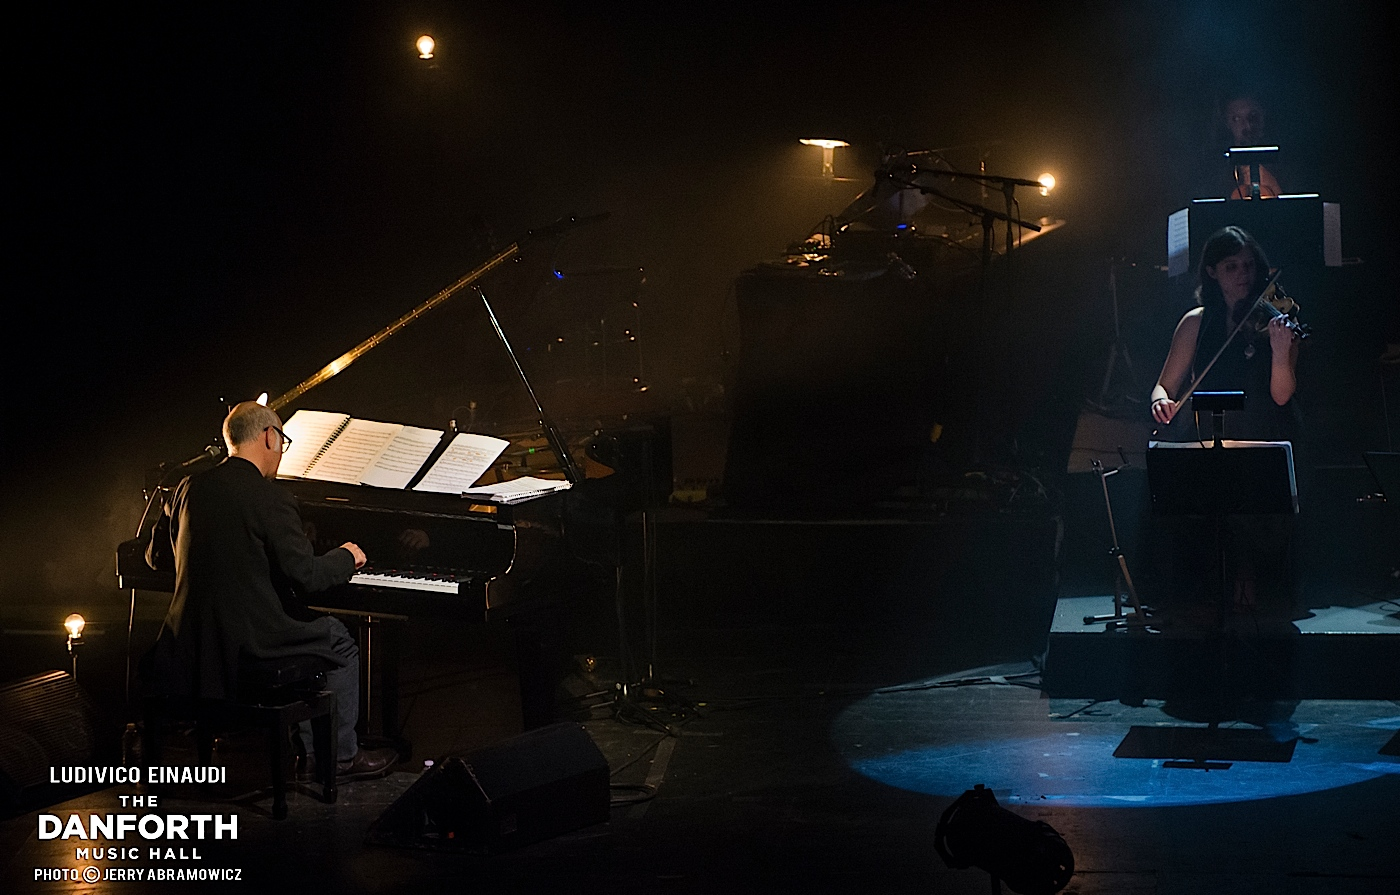 20130517 Ludivico Einaudi performs at The Danforth Music Hall Toronto 0195